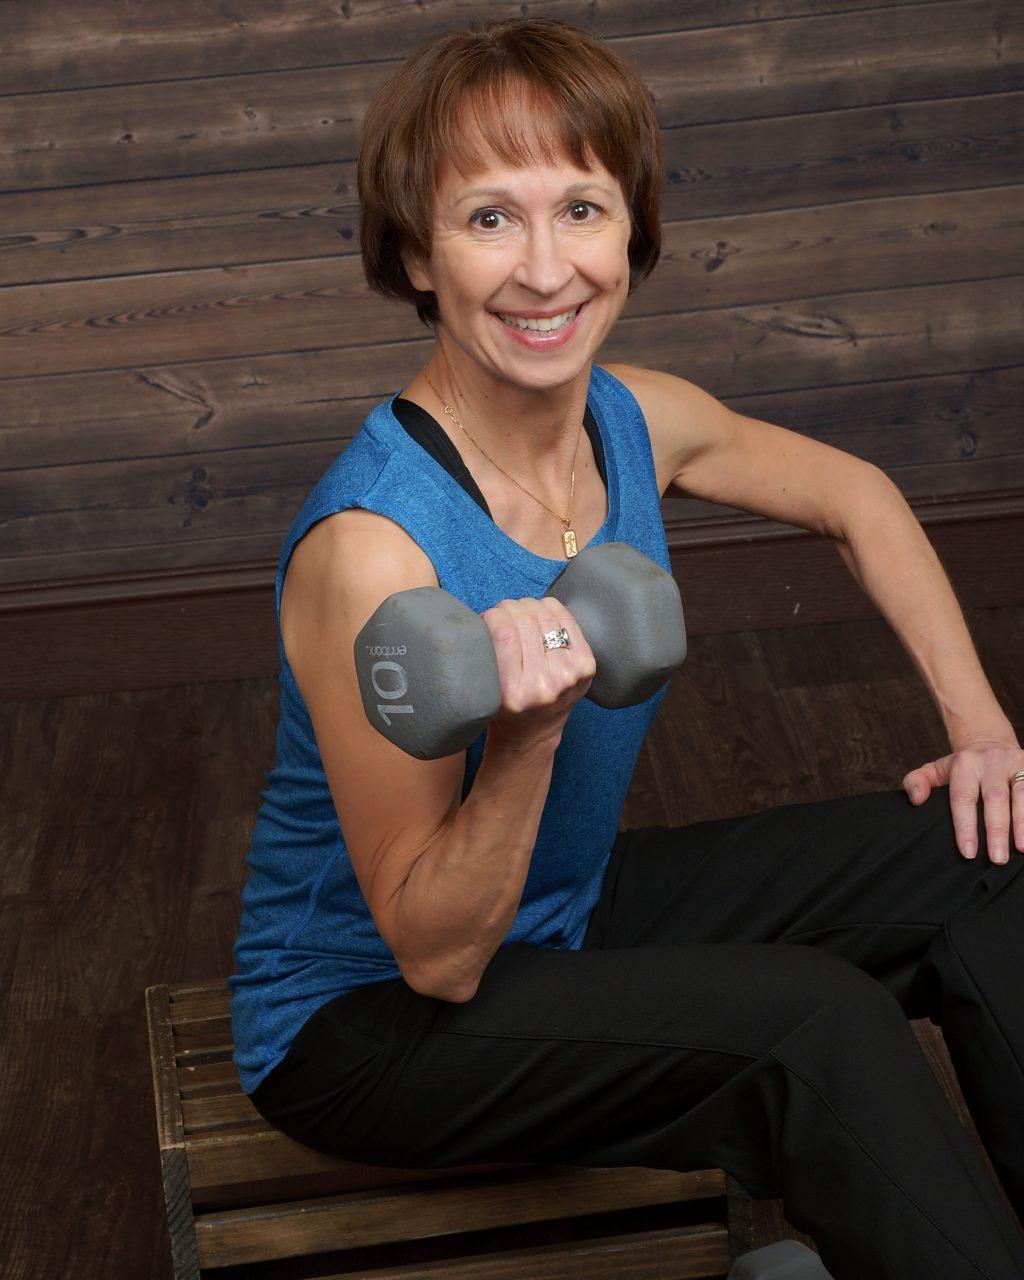 Personal Trainer Phoenix, Arizona - Angela Hoffman